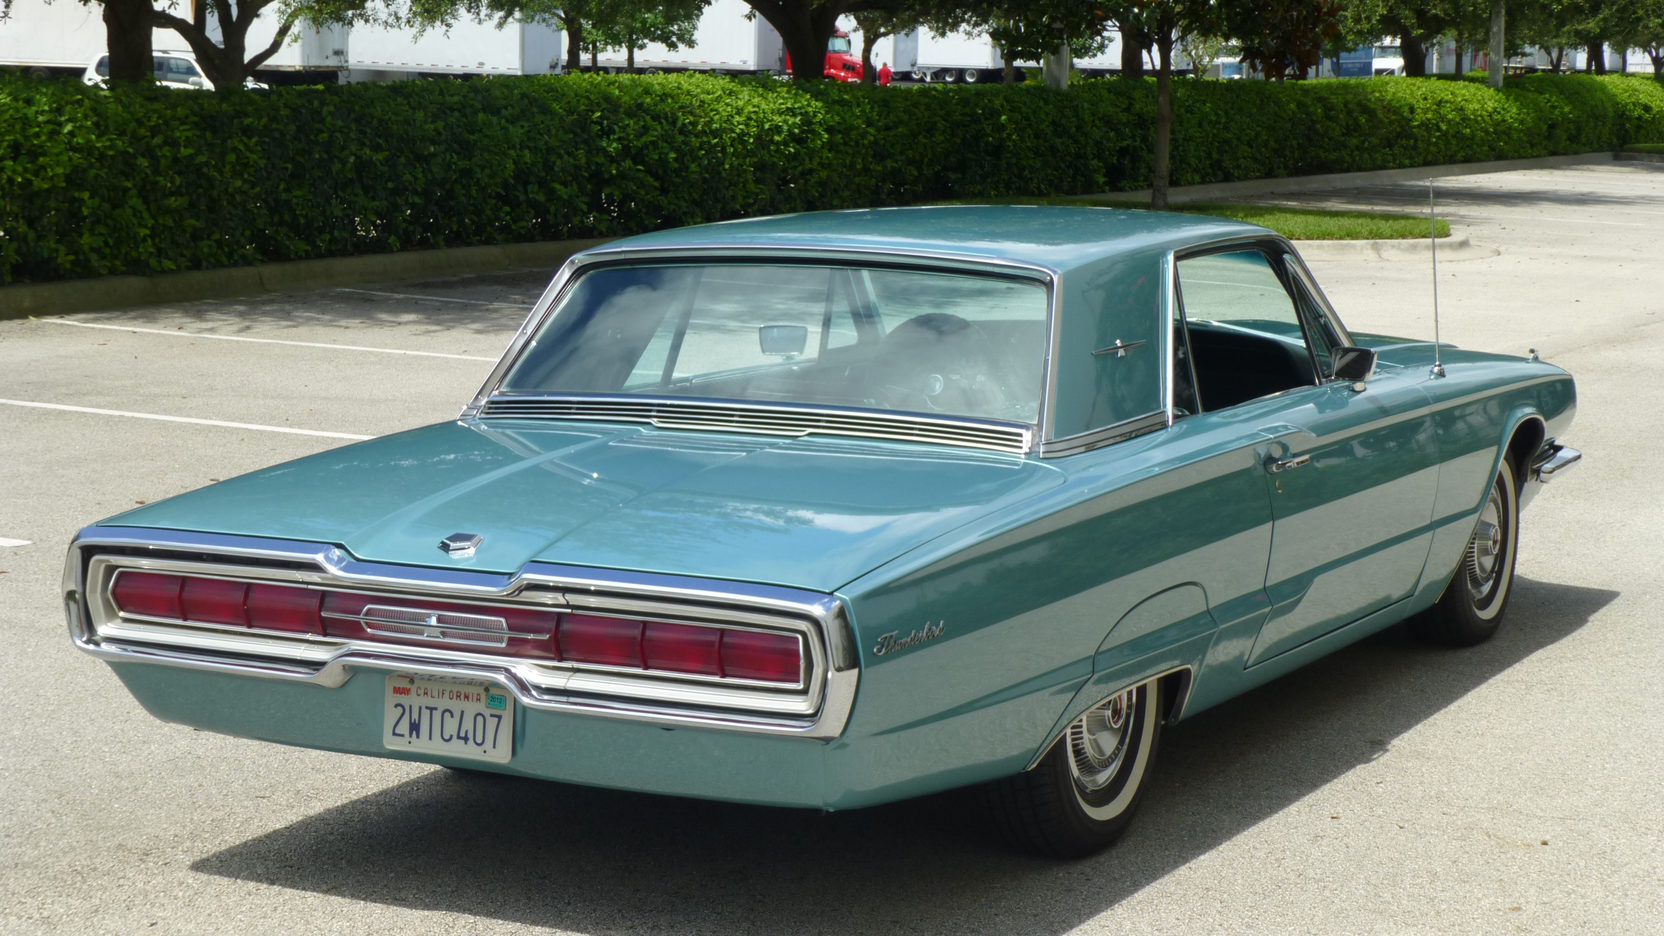 1966 Ford Thunderbird rear 3/4